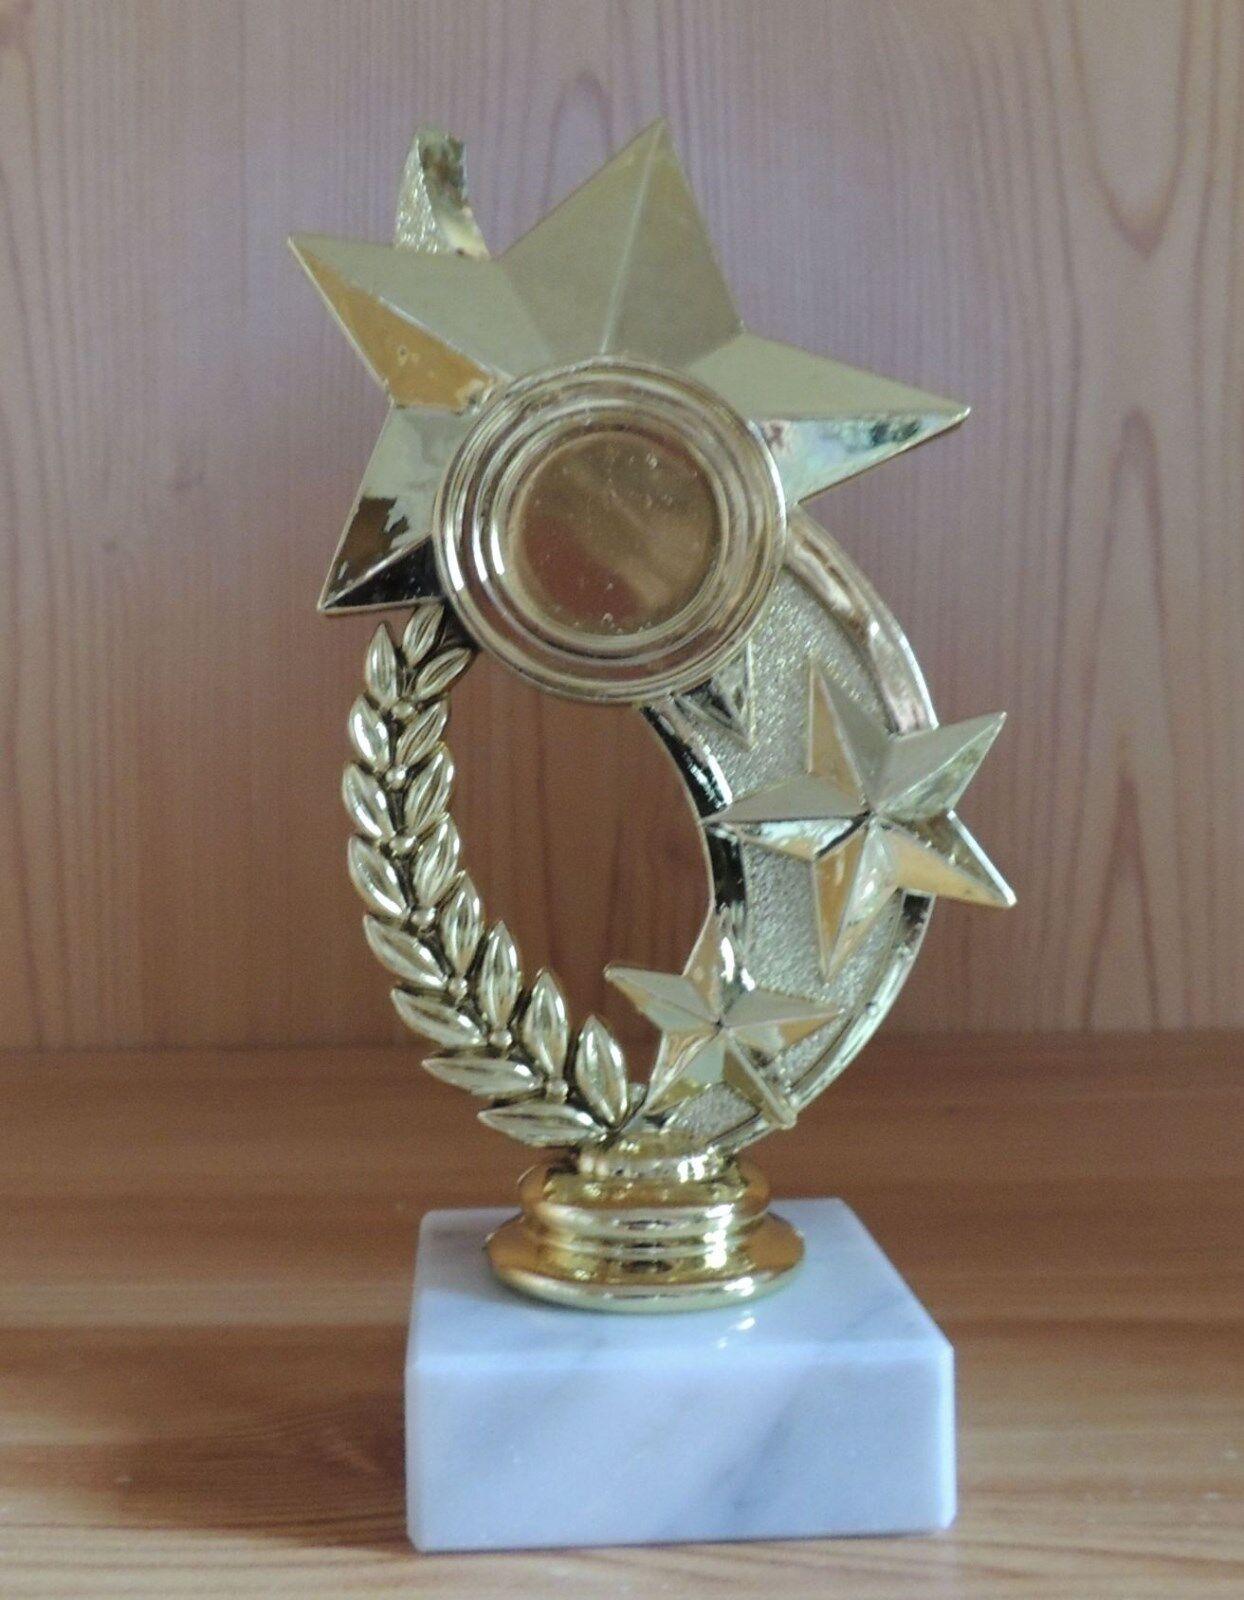 10 10 10 Pokale Figuren Stern mit Marmor 15cm  181 (Pokal Ehrenpreis Muttertag Sport) 55448f